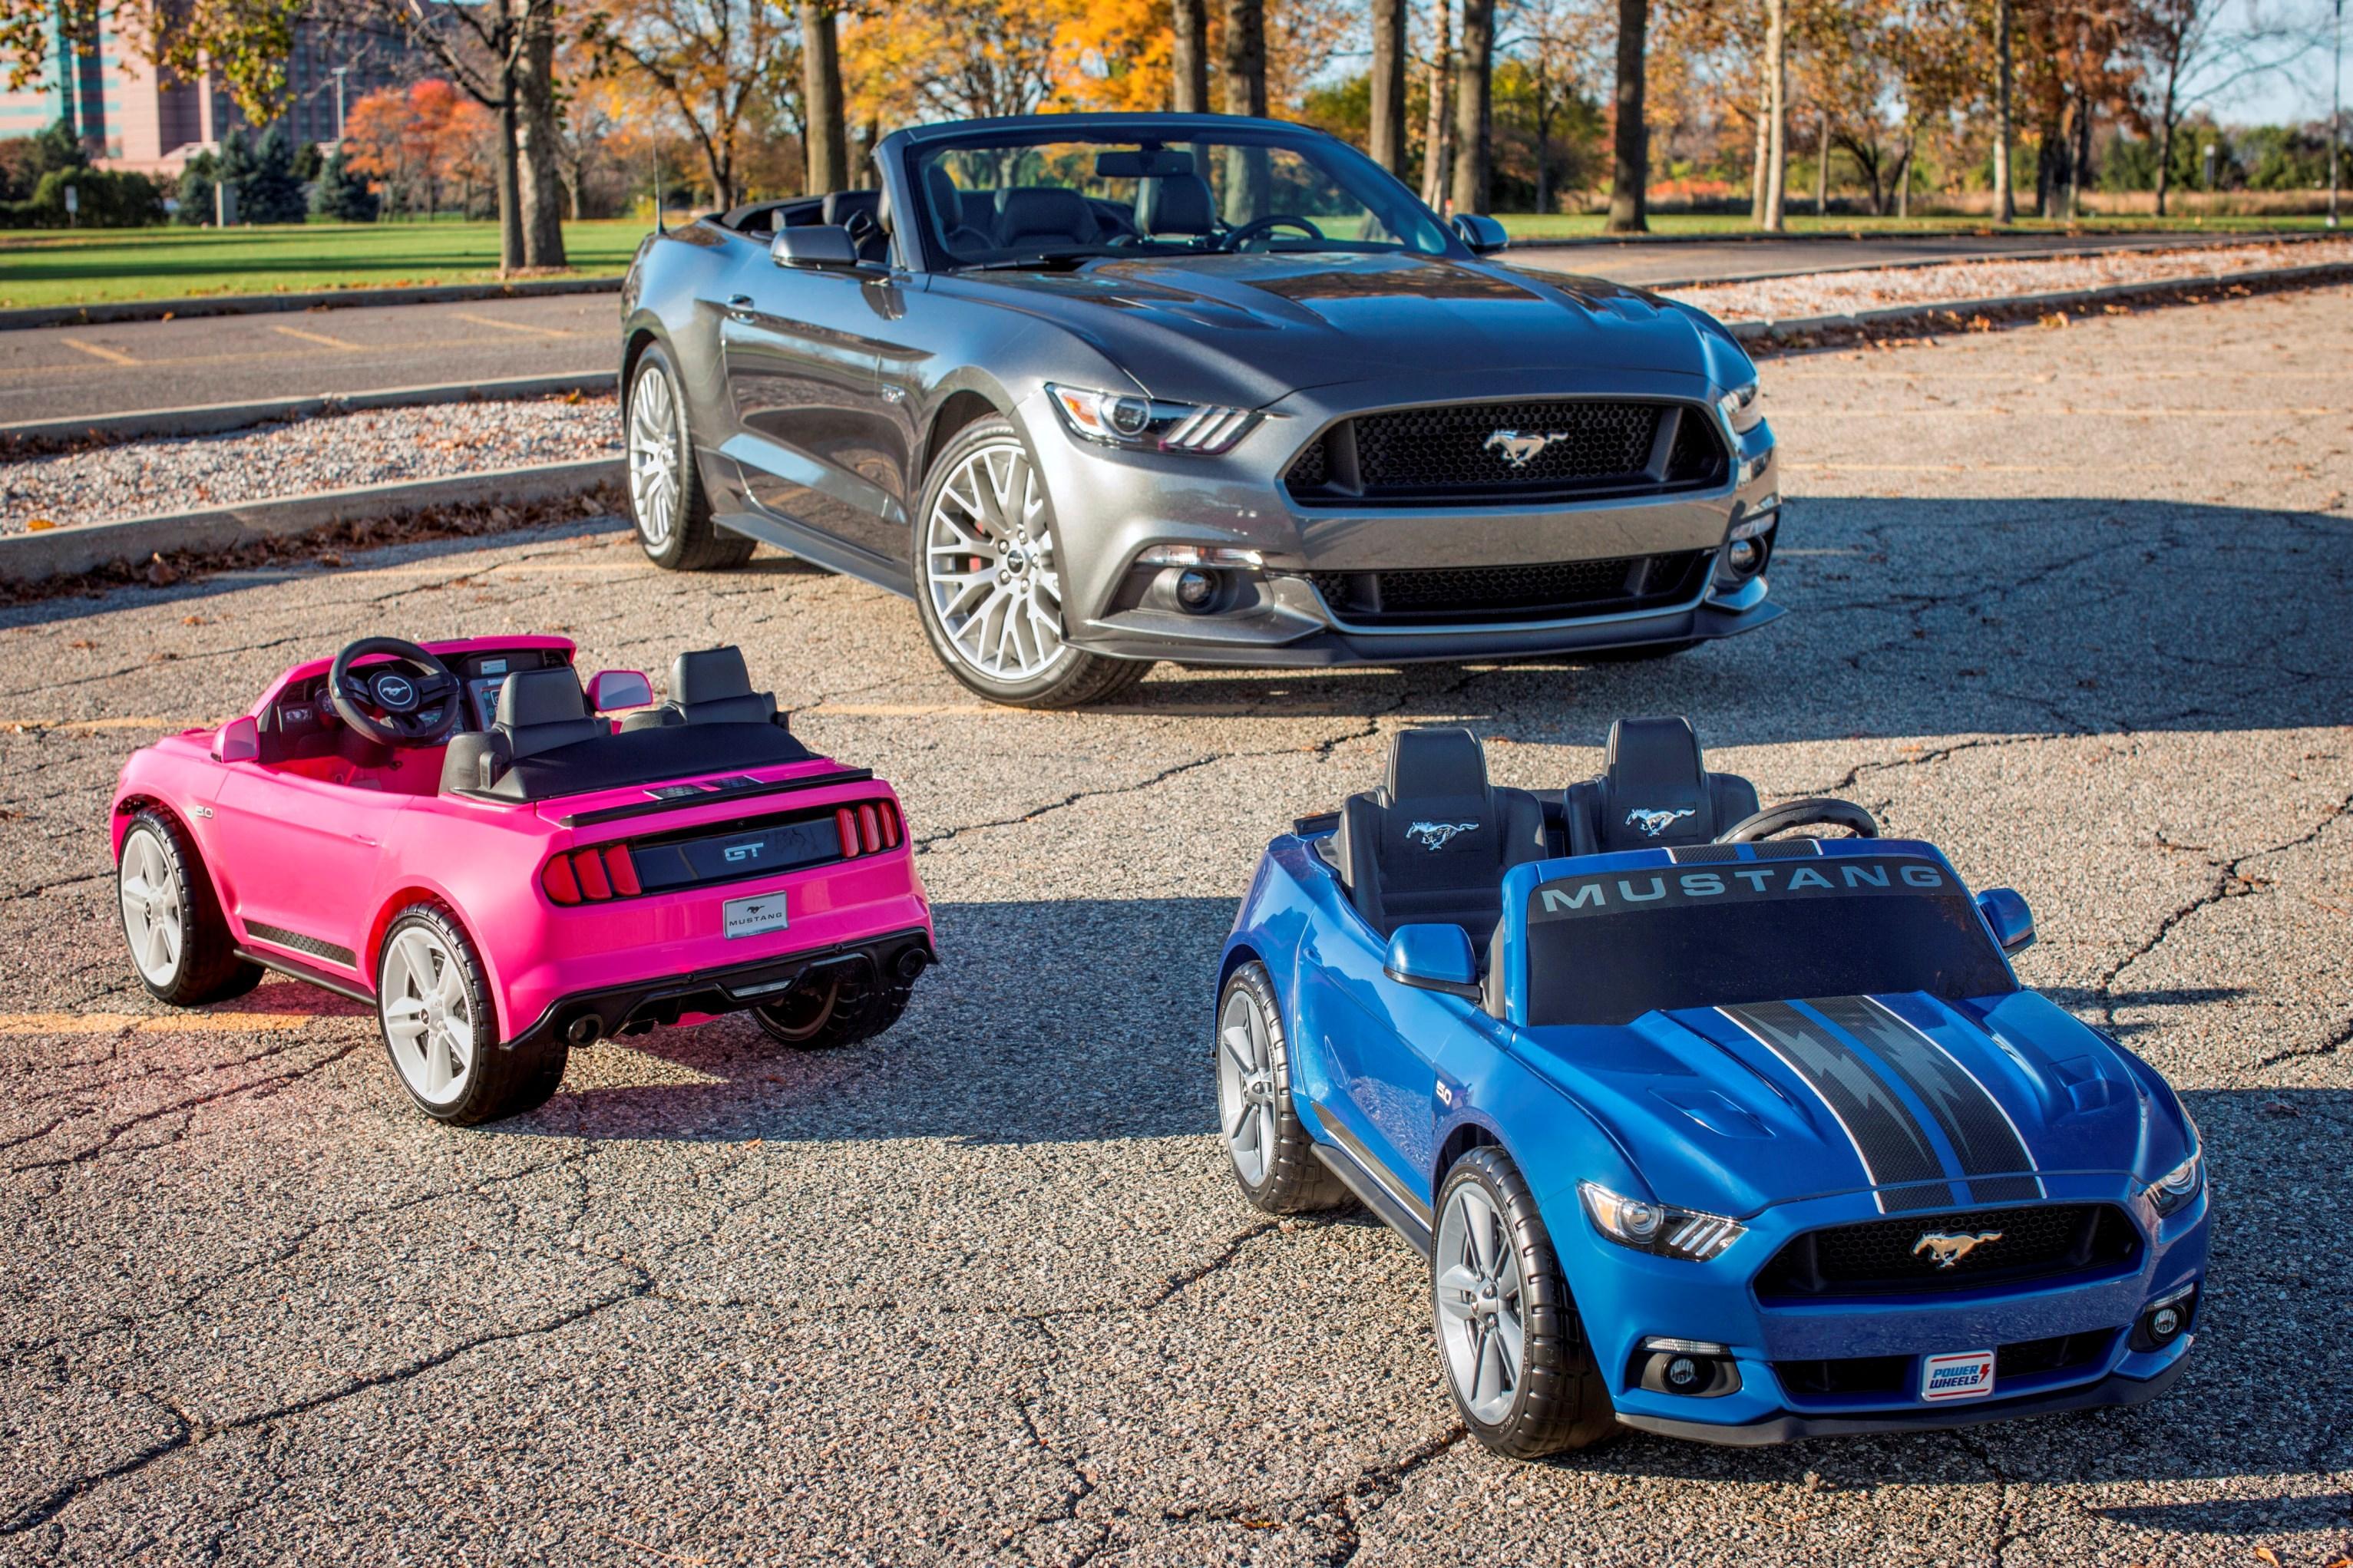 Ford Und Fisher Price Prasentieren Ford Mustang Modell Fur